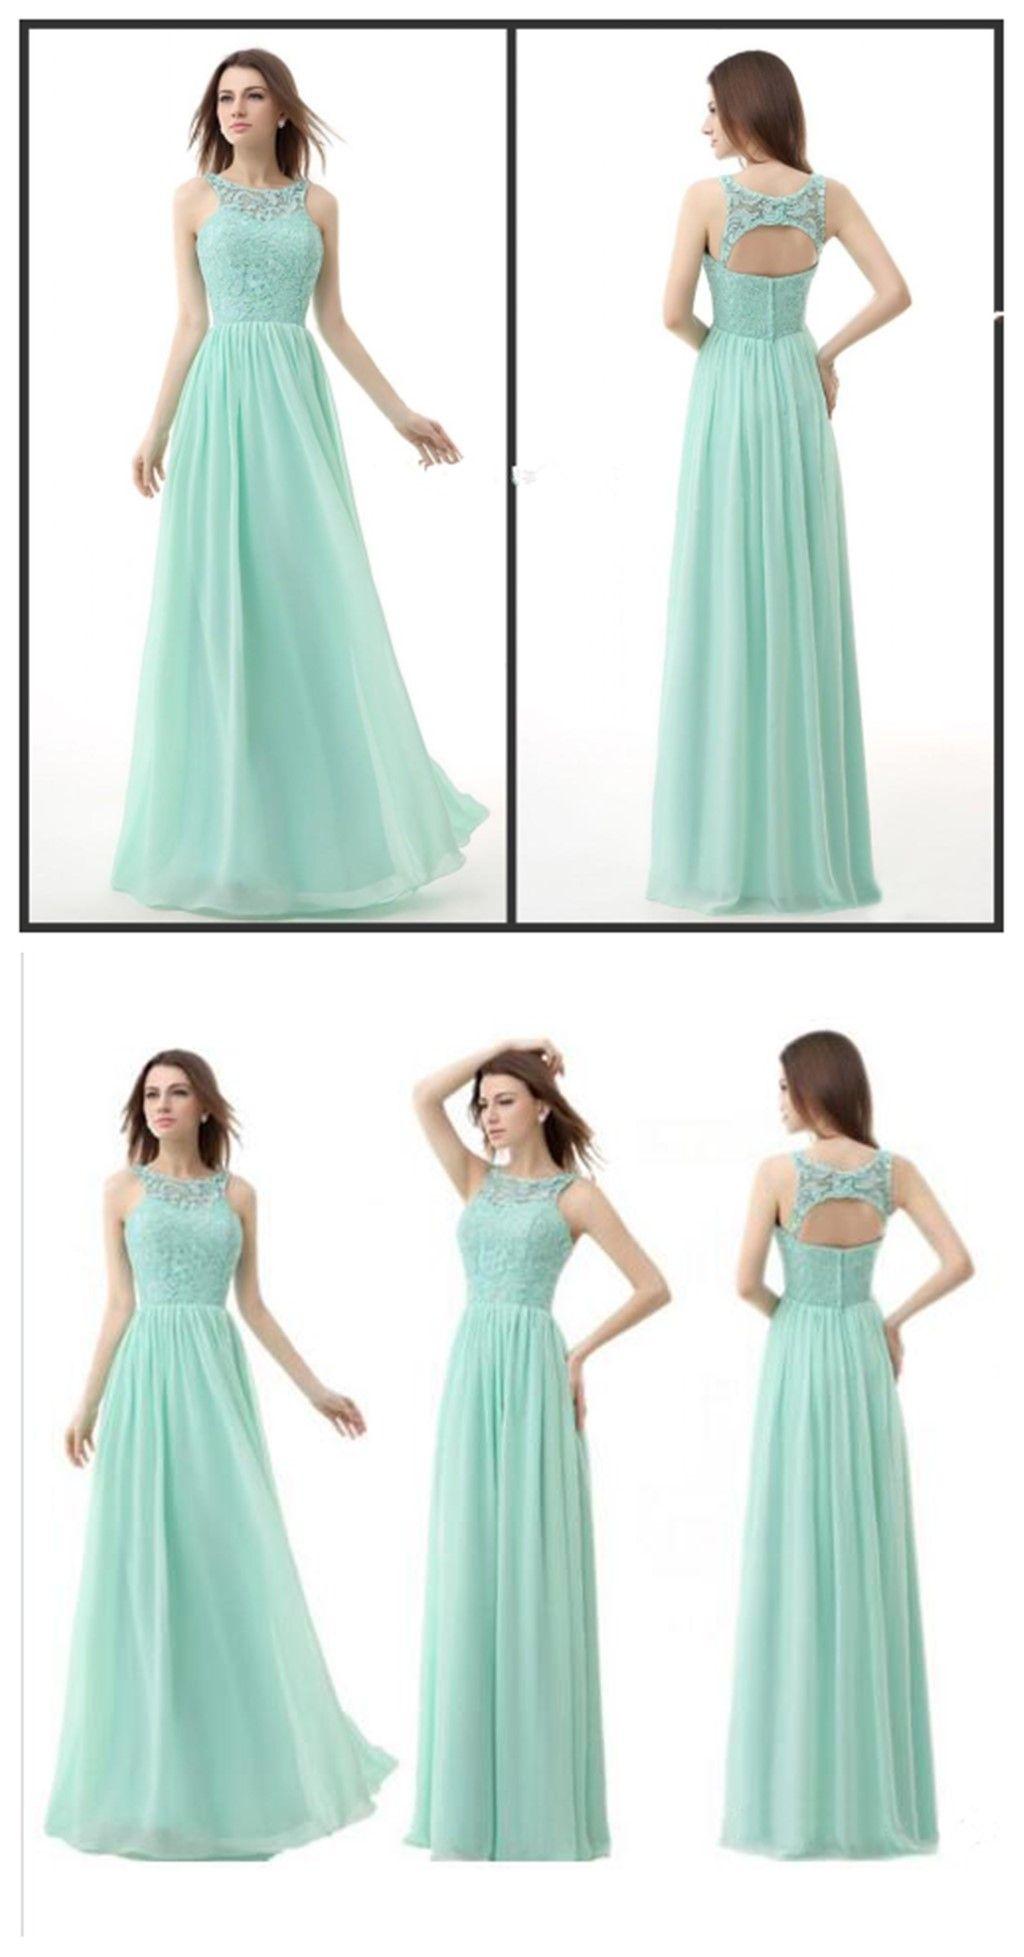 Mint lace bridesmaid dresses, open back bridesmaid dresses, chiffon ...